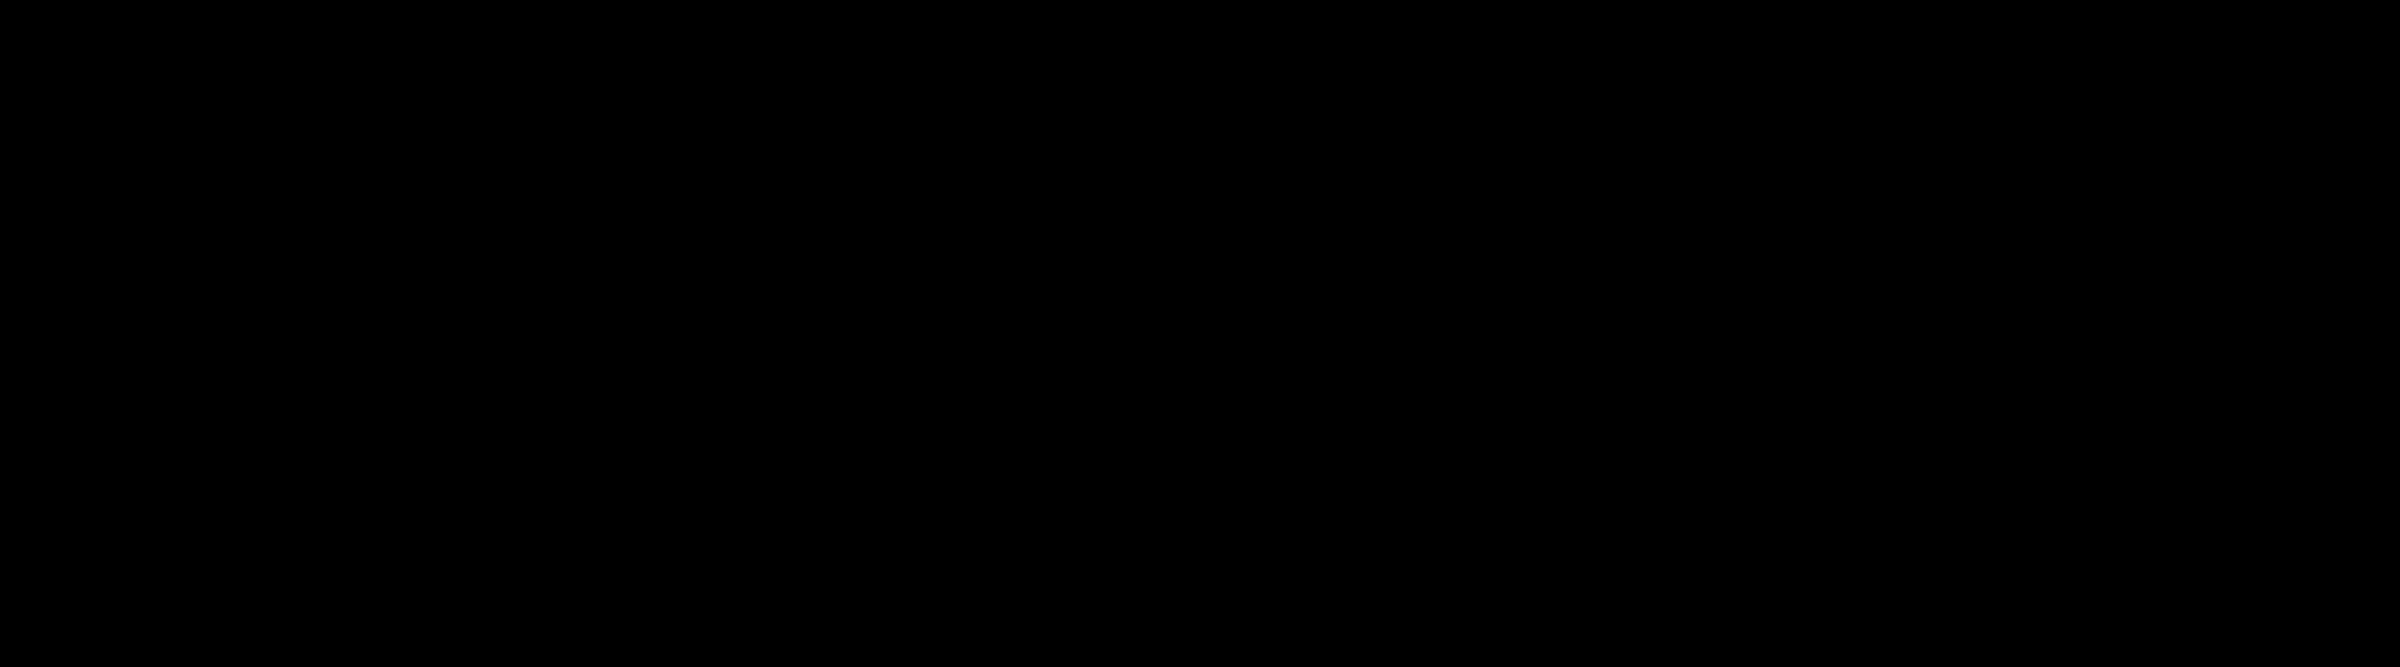 BOSS Logo PNG Transparent & SVG Vector.